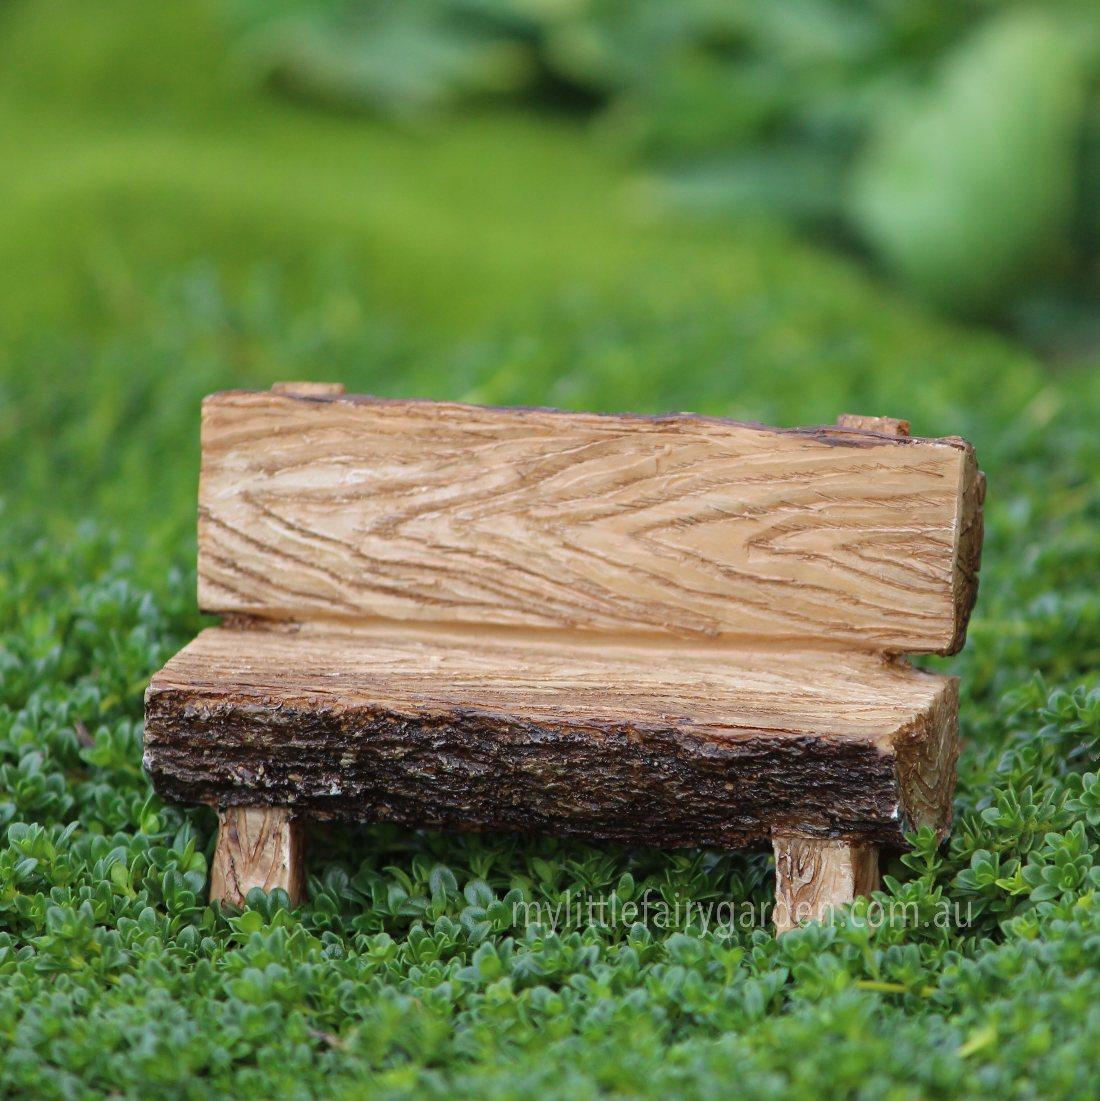 Fairy gardens wa australia miniature fairies furniture for How to make miniature garden furniture